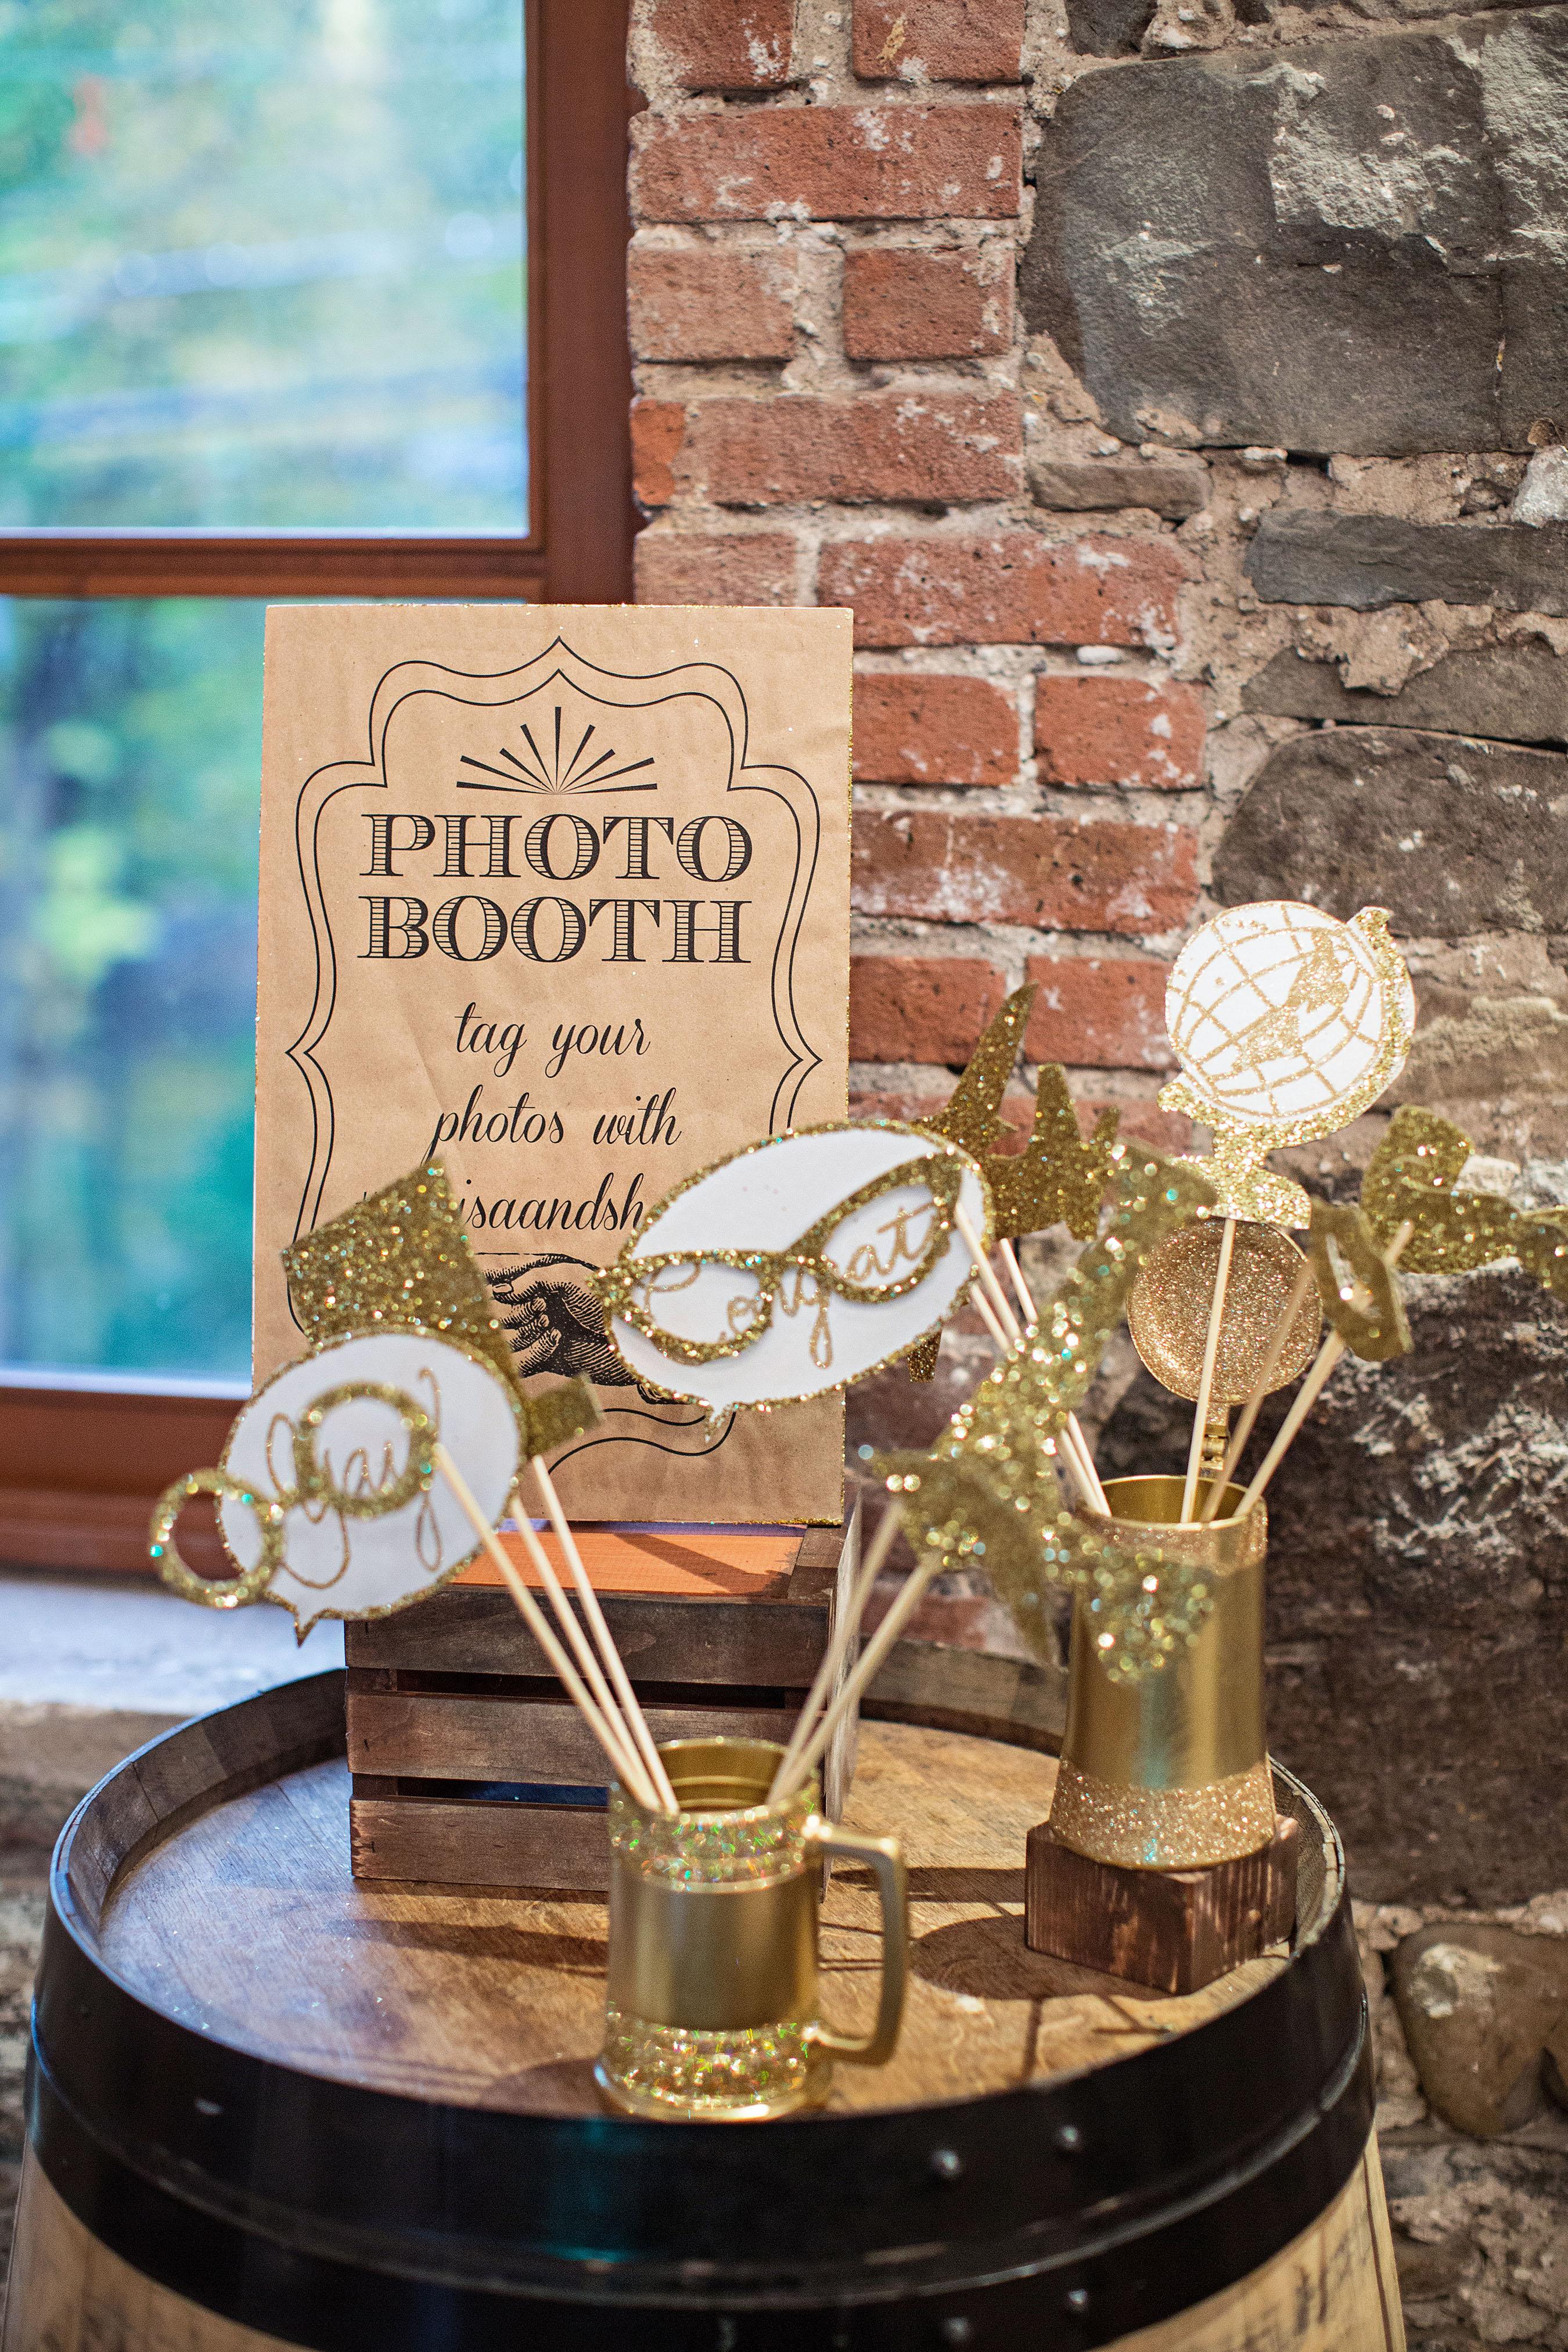 photo booth props gold glitter bubbles glasses